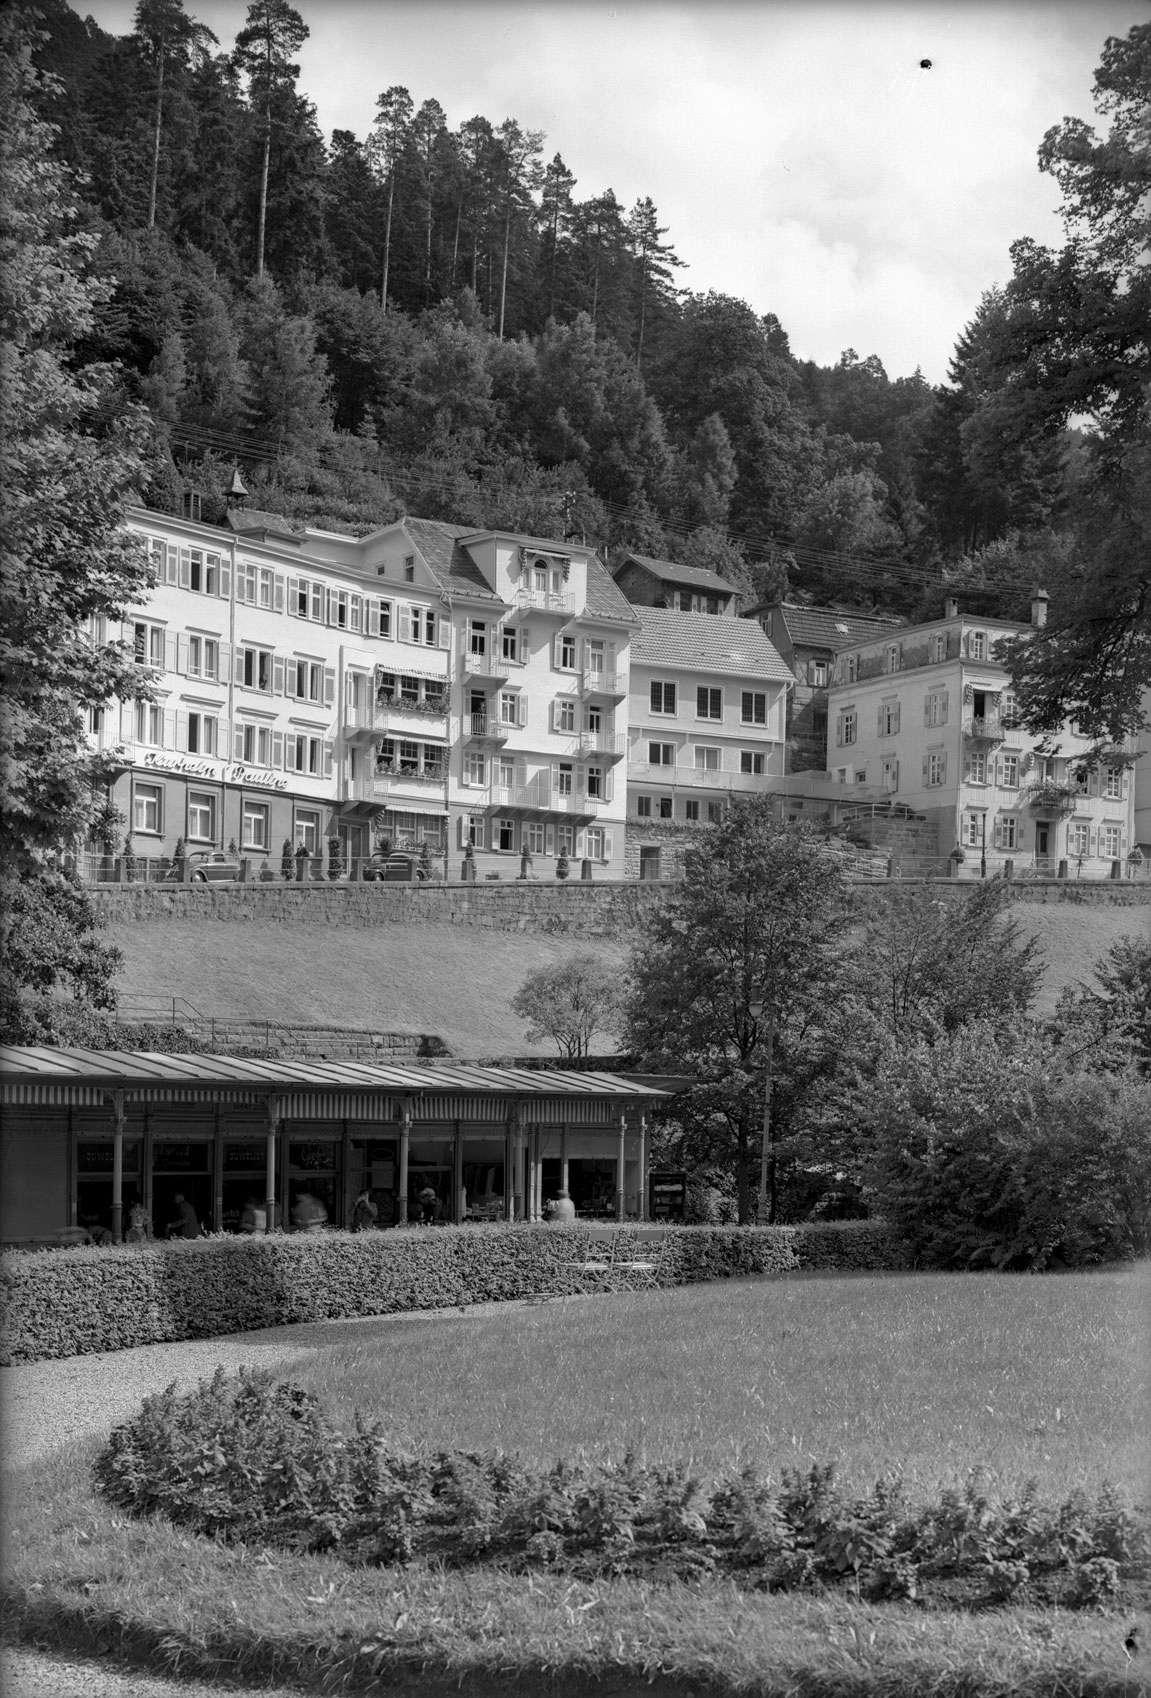 Wildbad und Calmbach u.a. 1954, Nr 002